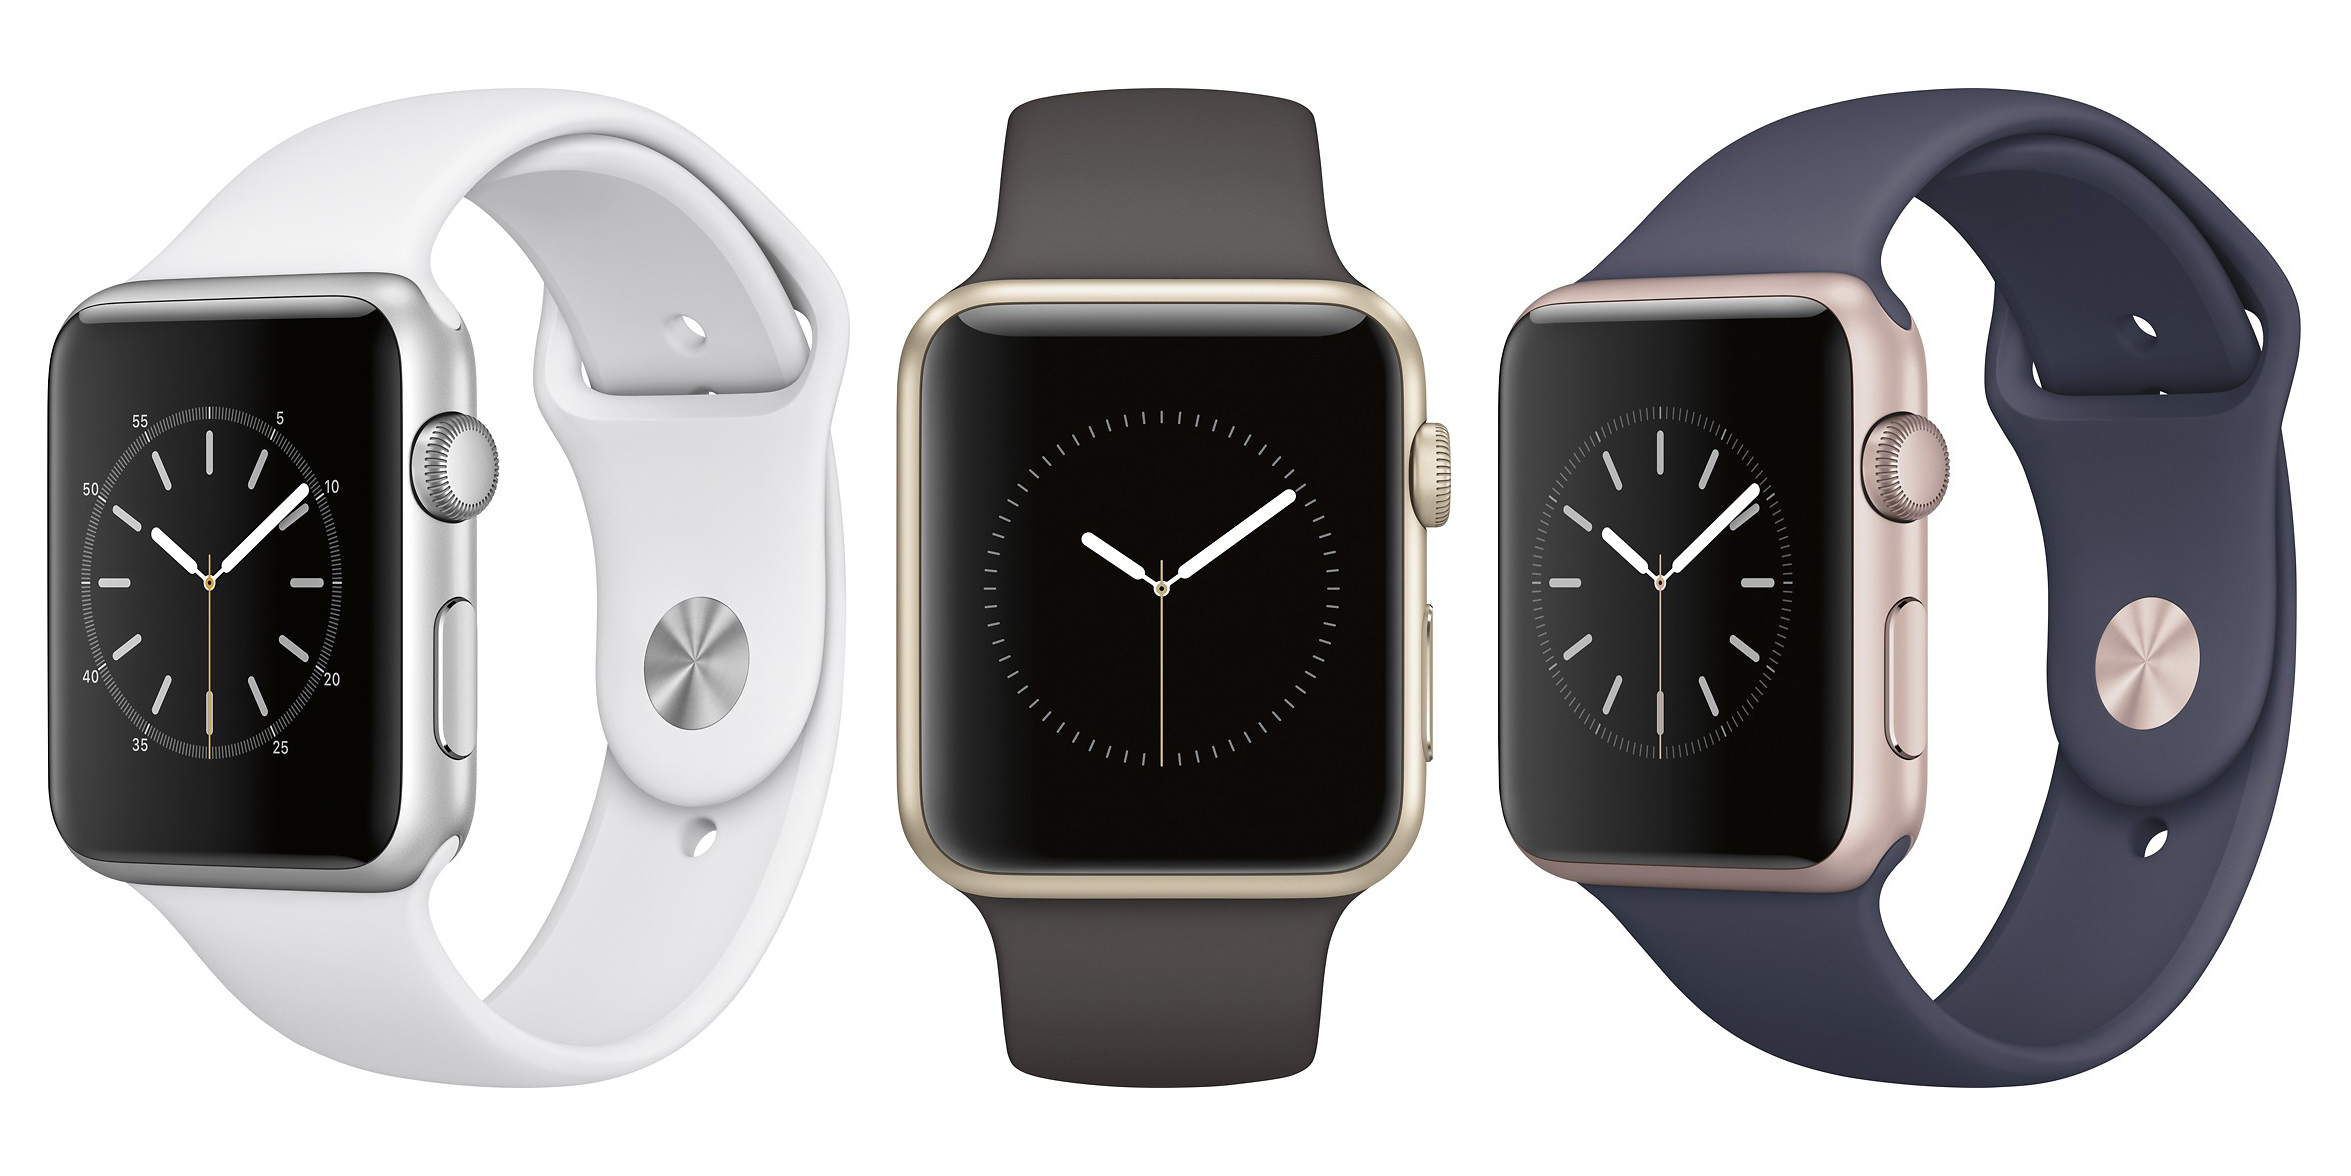 Apple Watch Series 2 sees 1-day sale to $150 in various colors (Refurb, Orig. $369+)